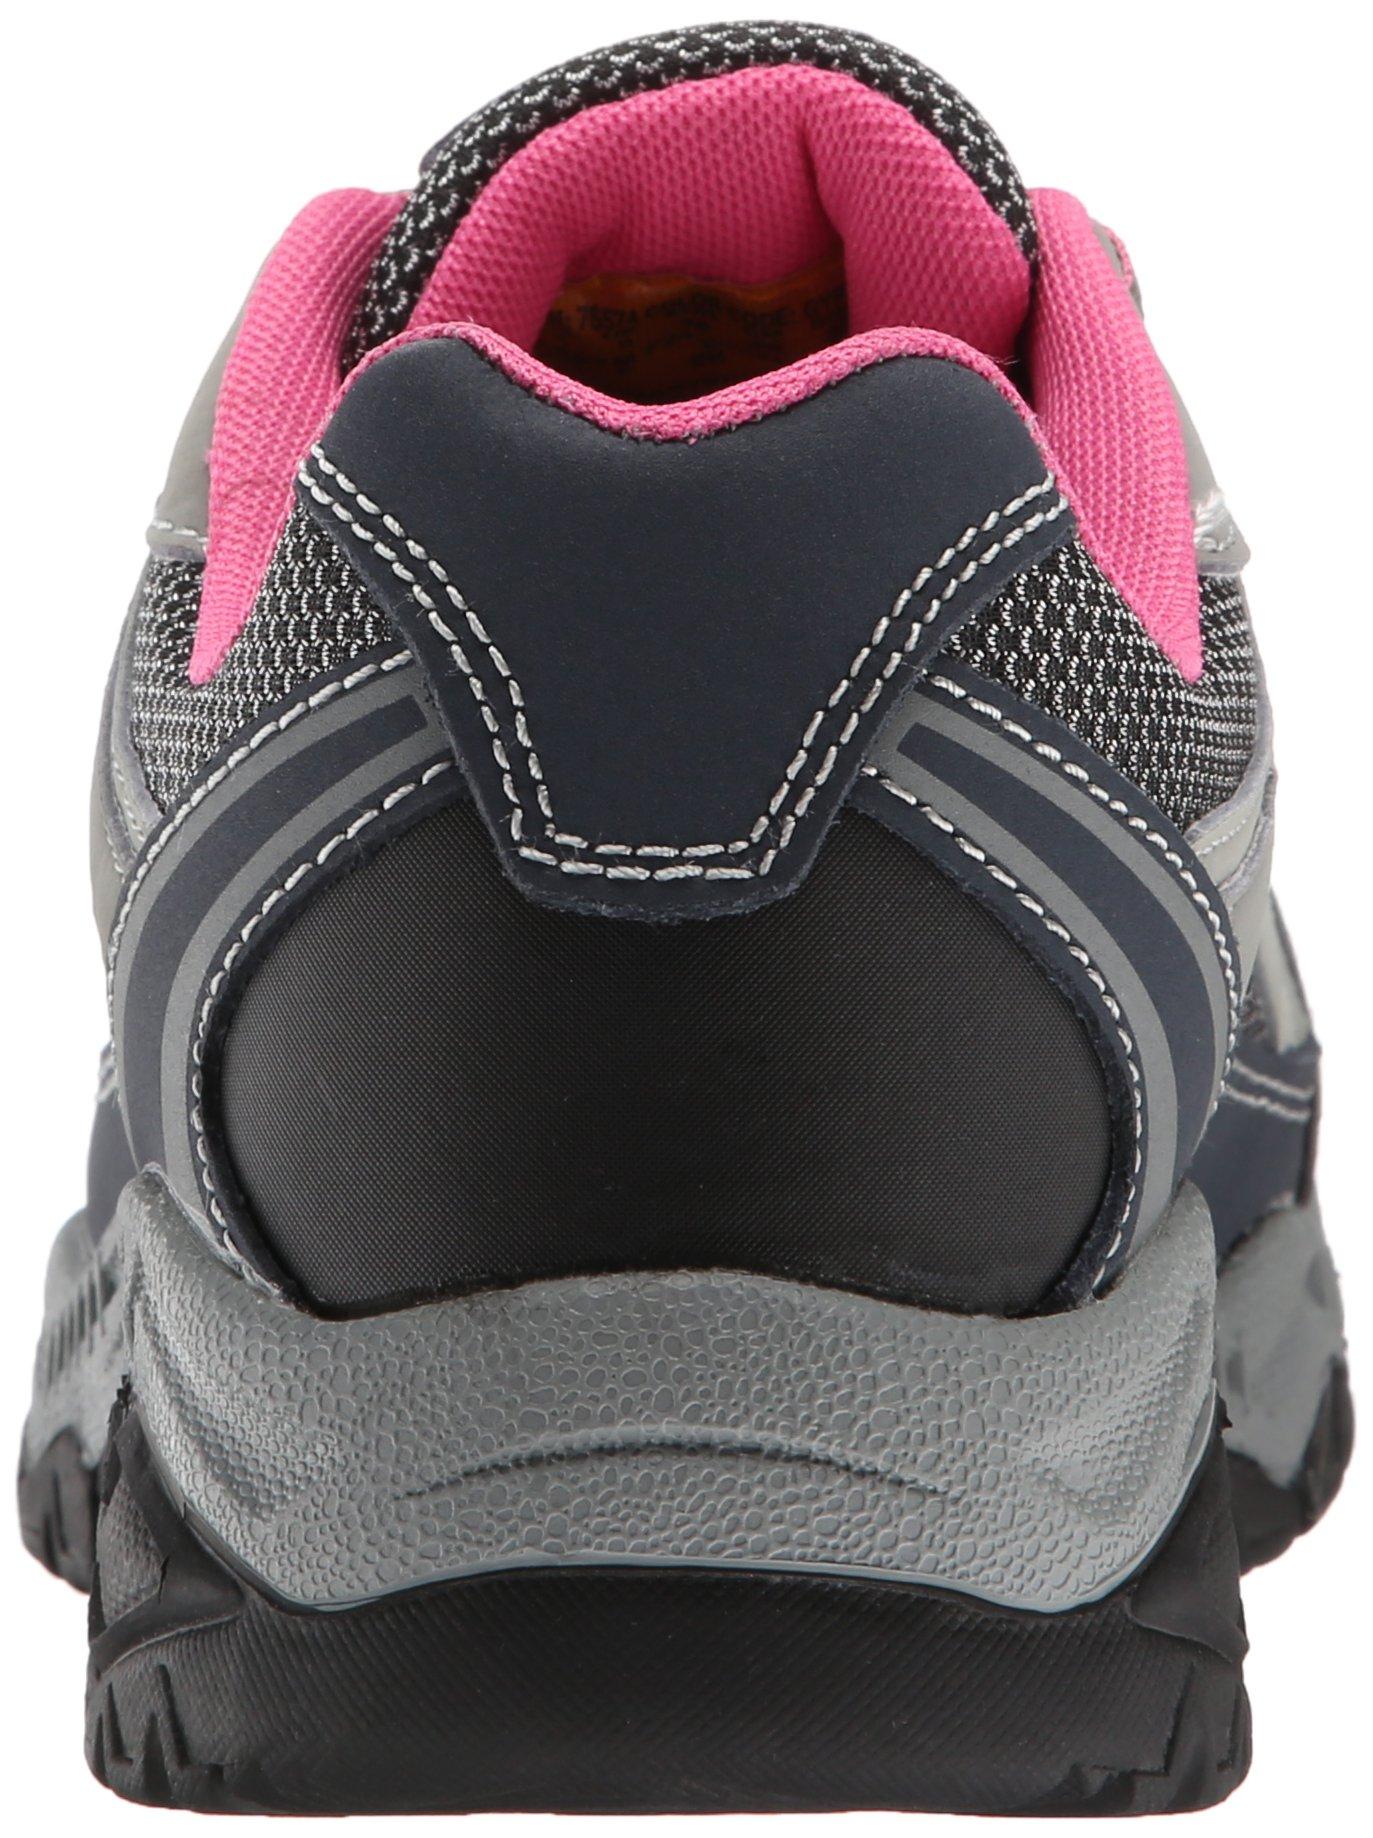 Skechers for Work Women's Doyline Hiker Boot, Gray Pink, 9 M US by Skechers (Image #2)